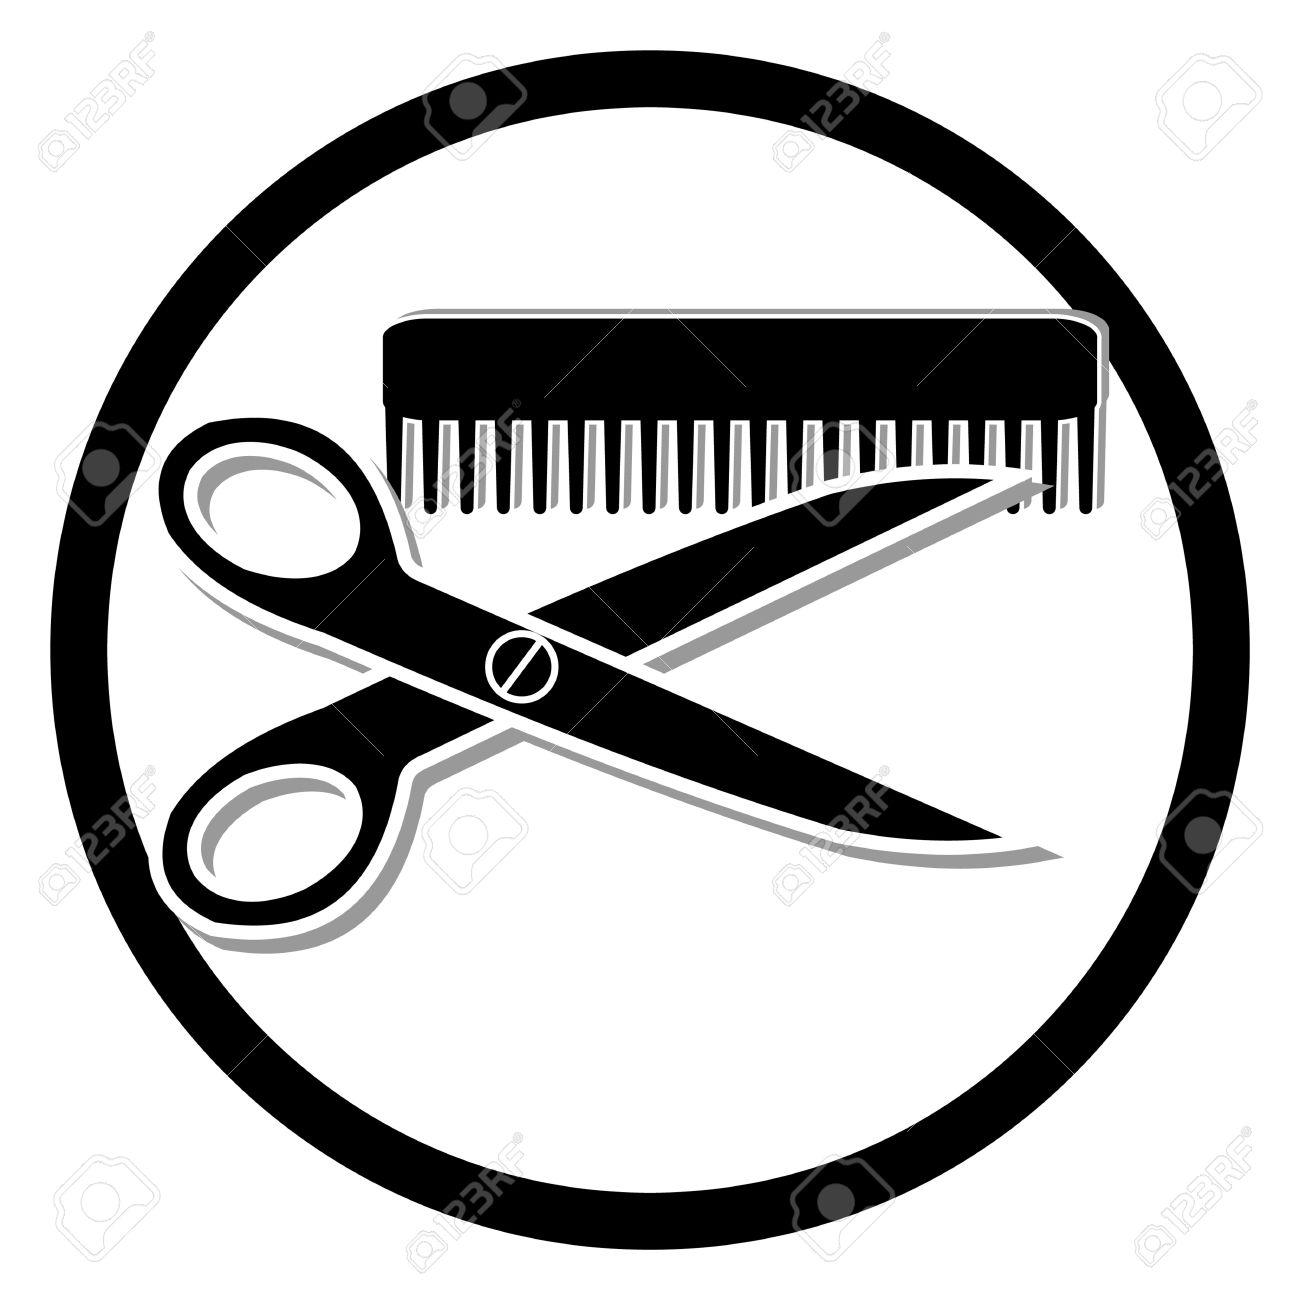 Haircuts Haircuts Haircutting Scissors Haircut